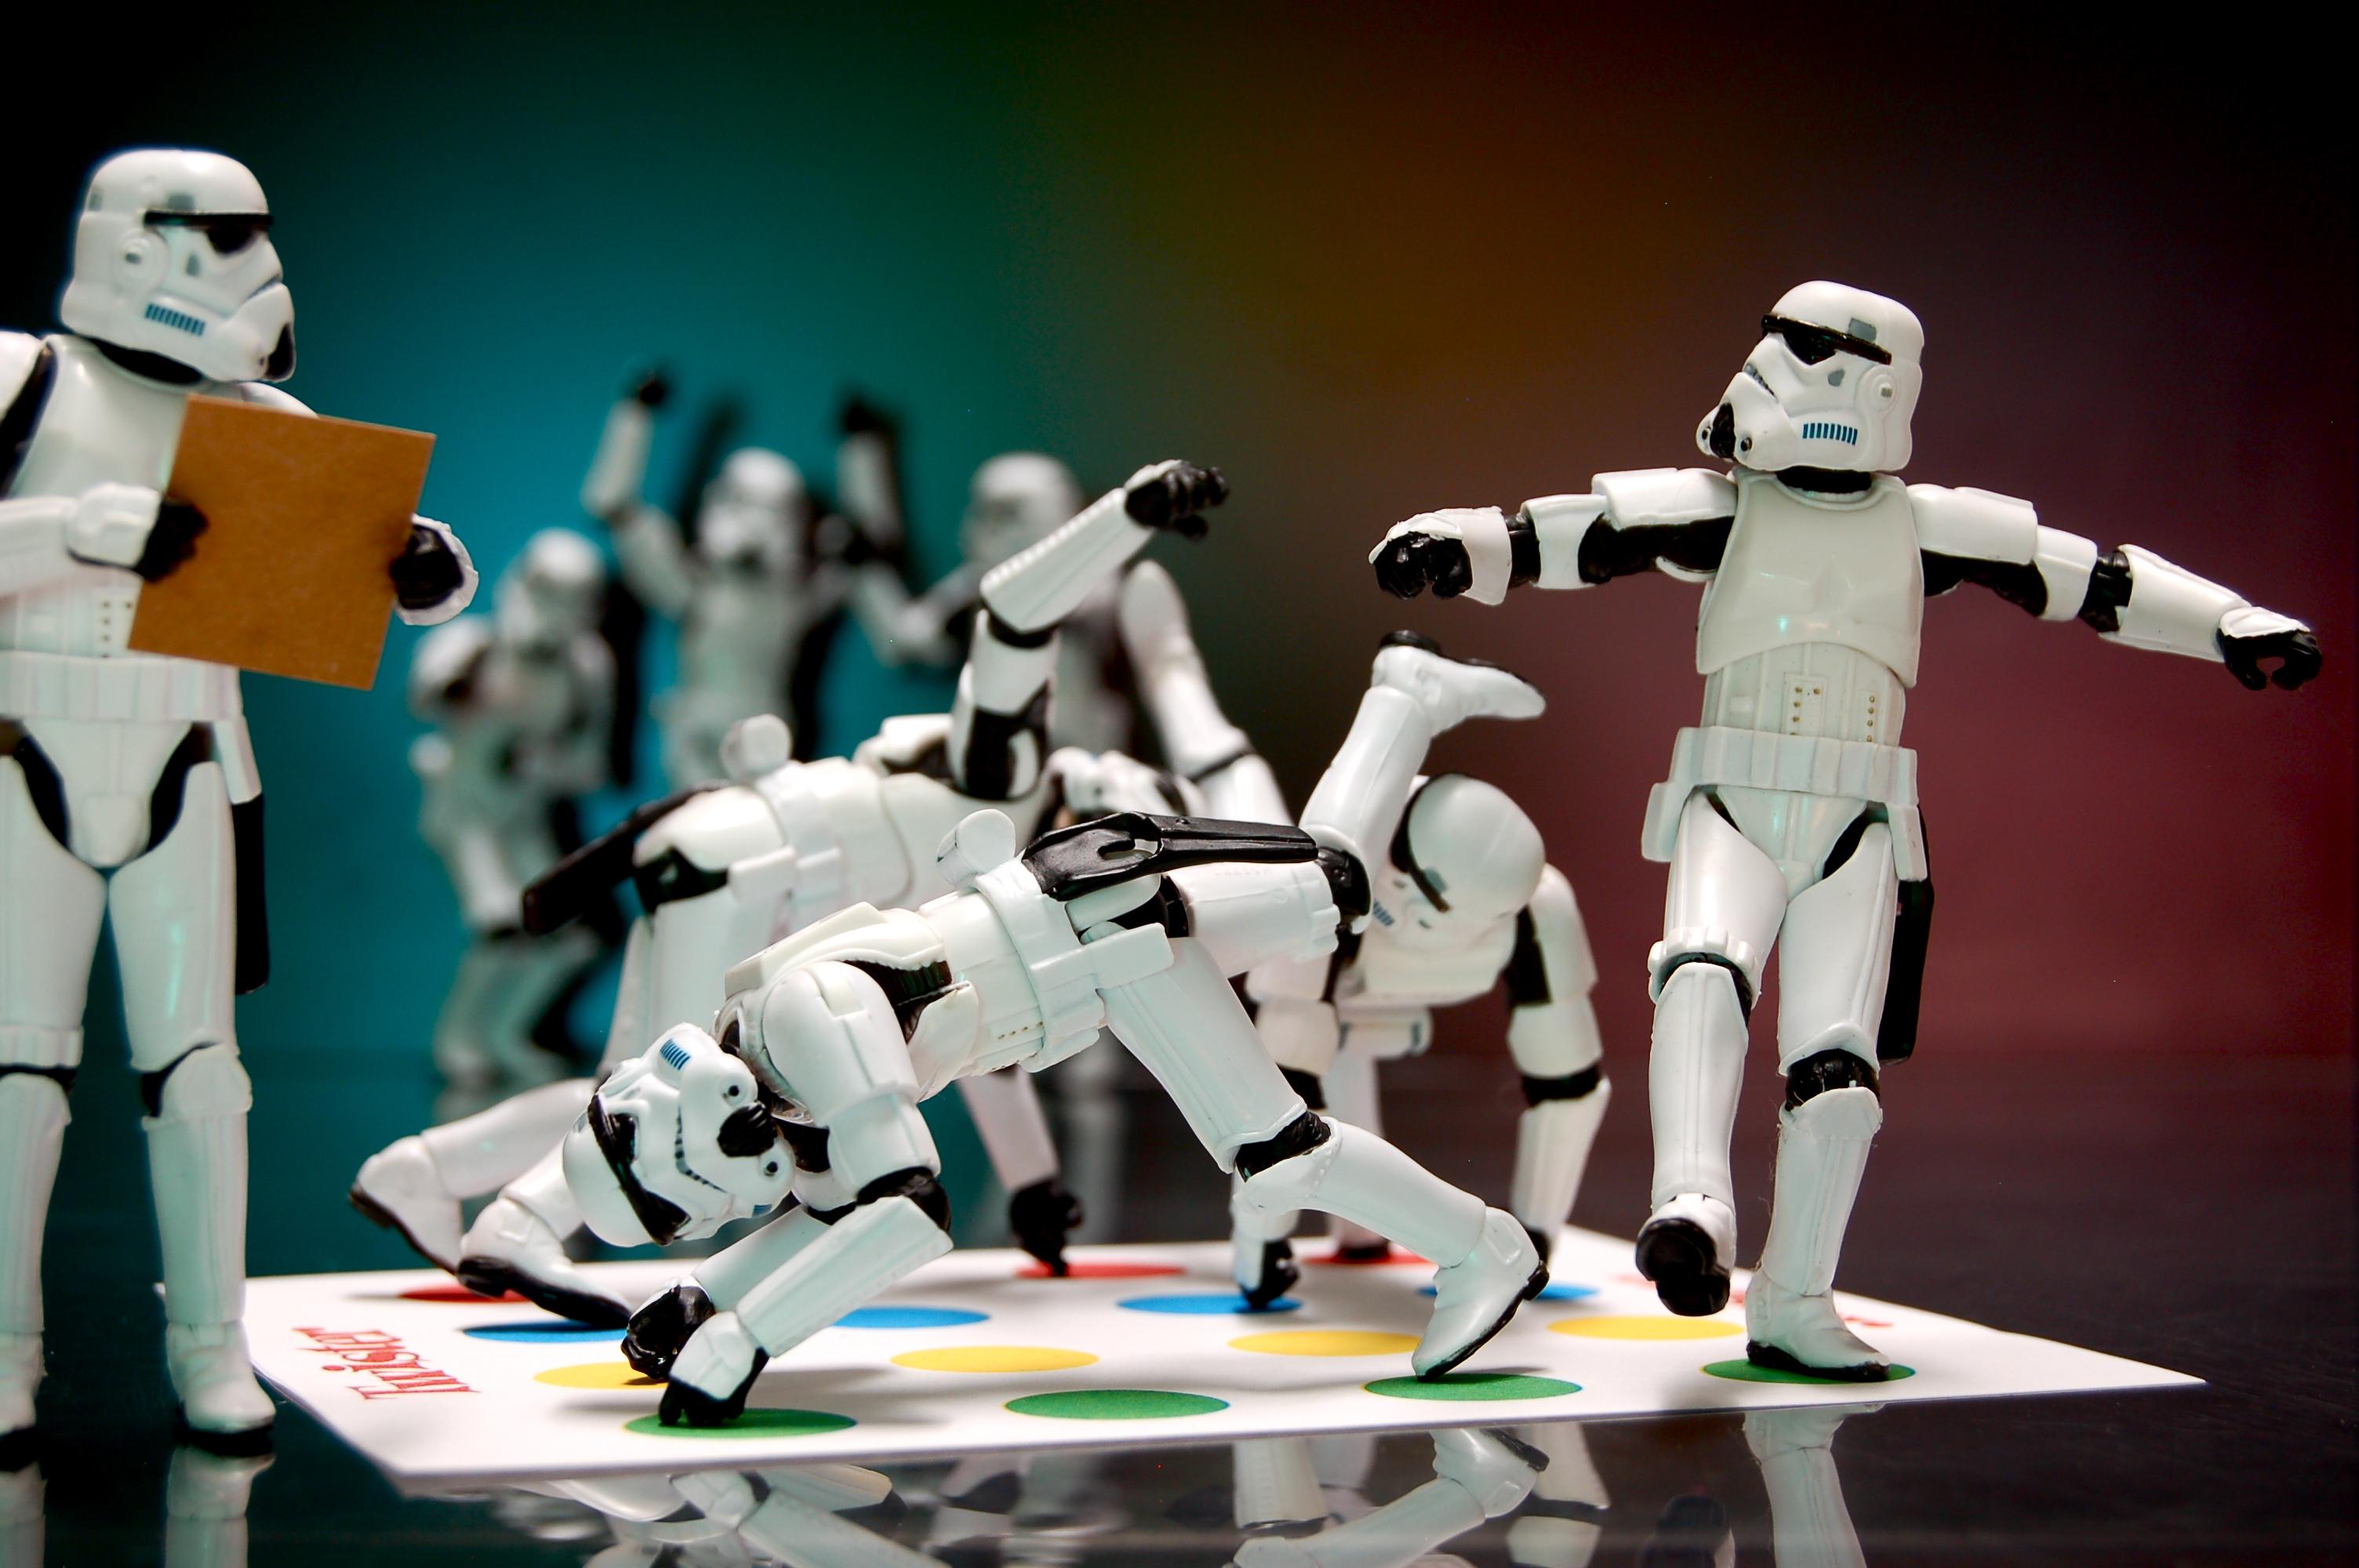 Wallpaper : favorite, Trooper, game, reflection, fun, Toy